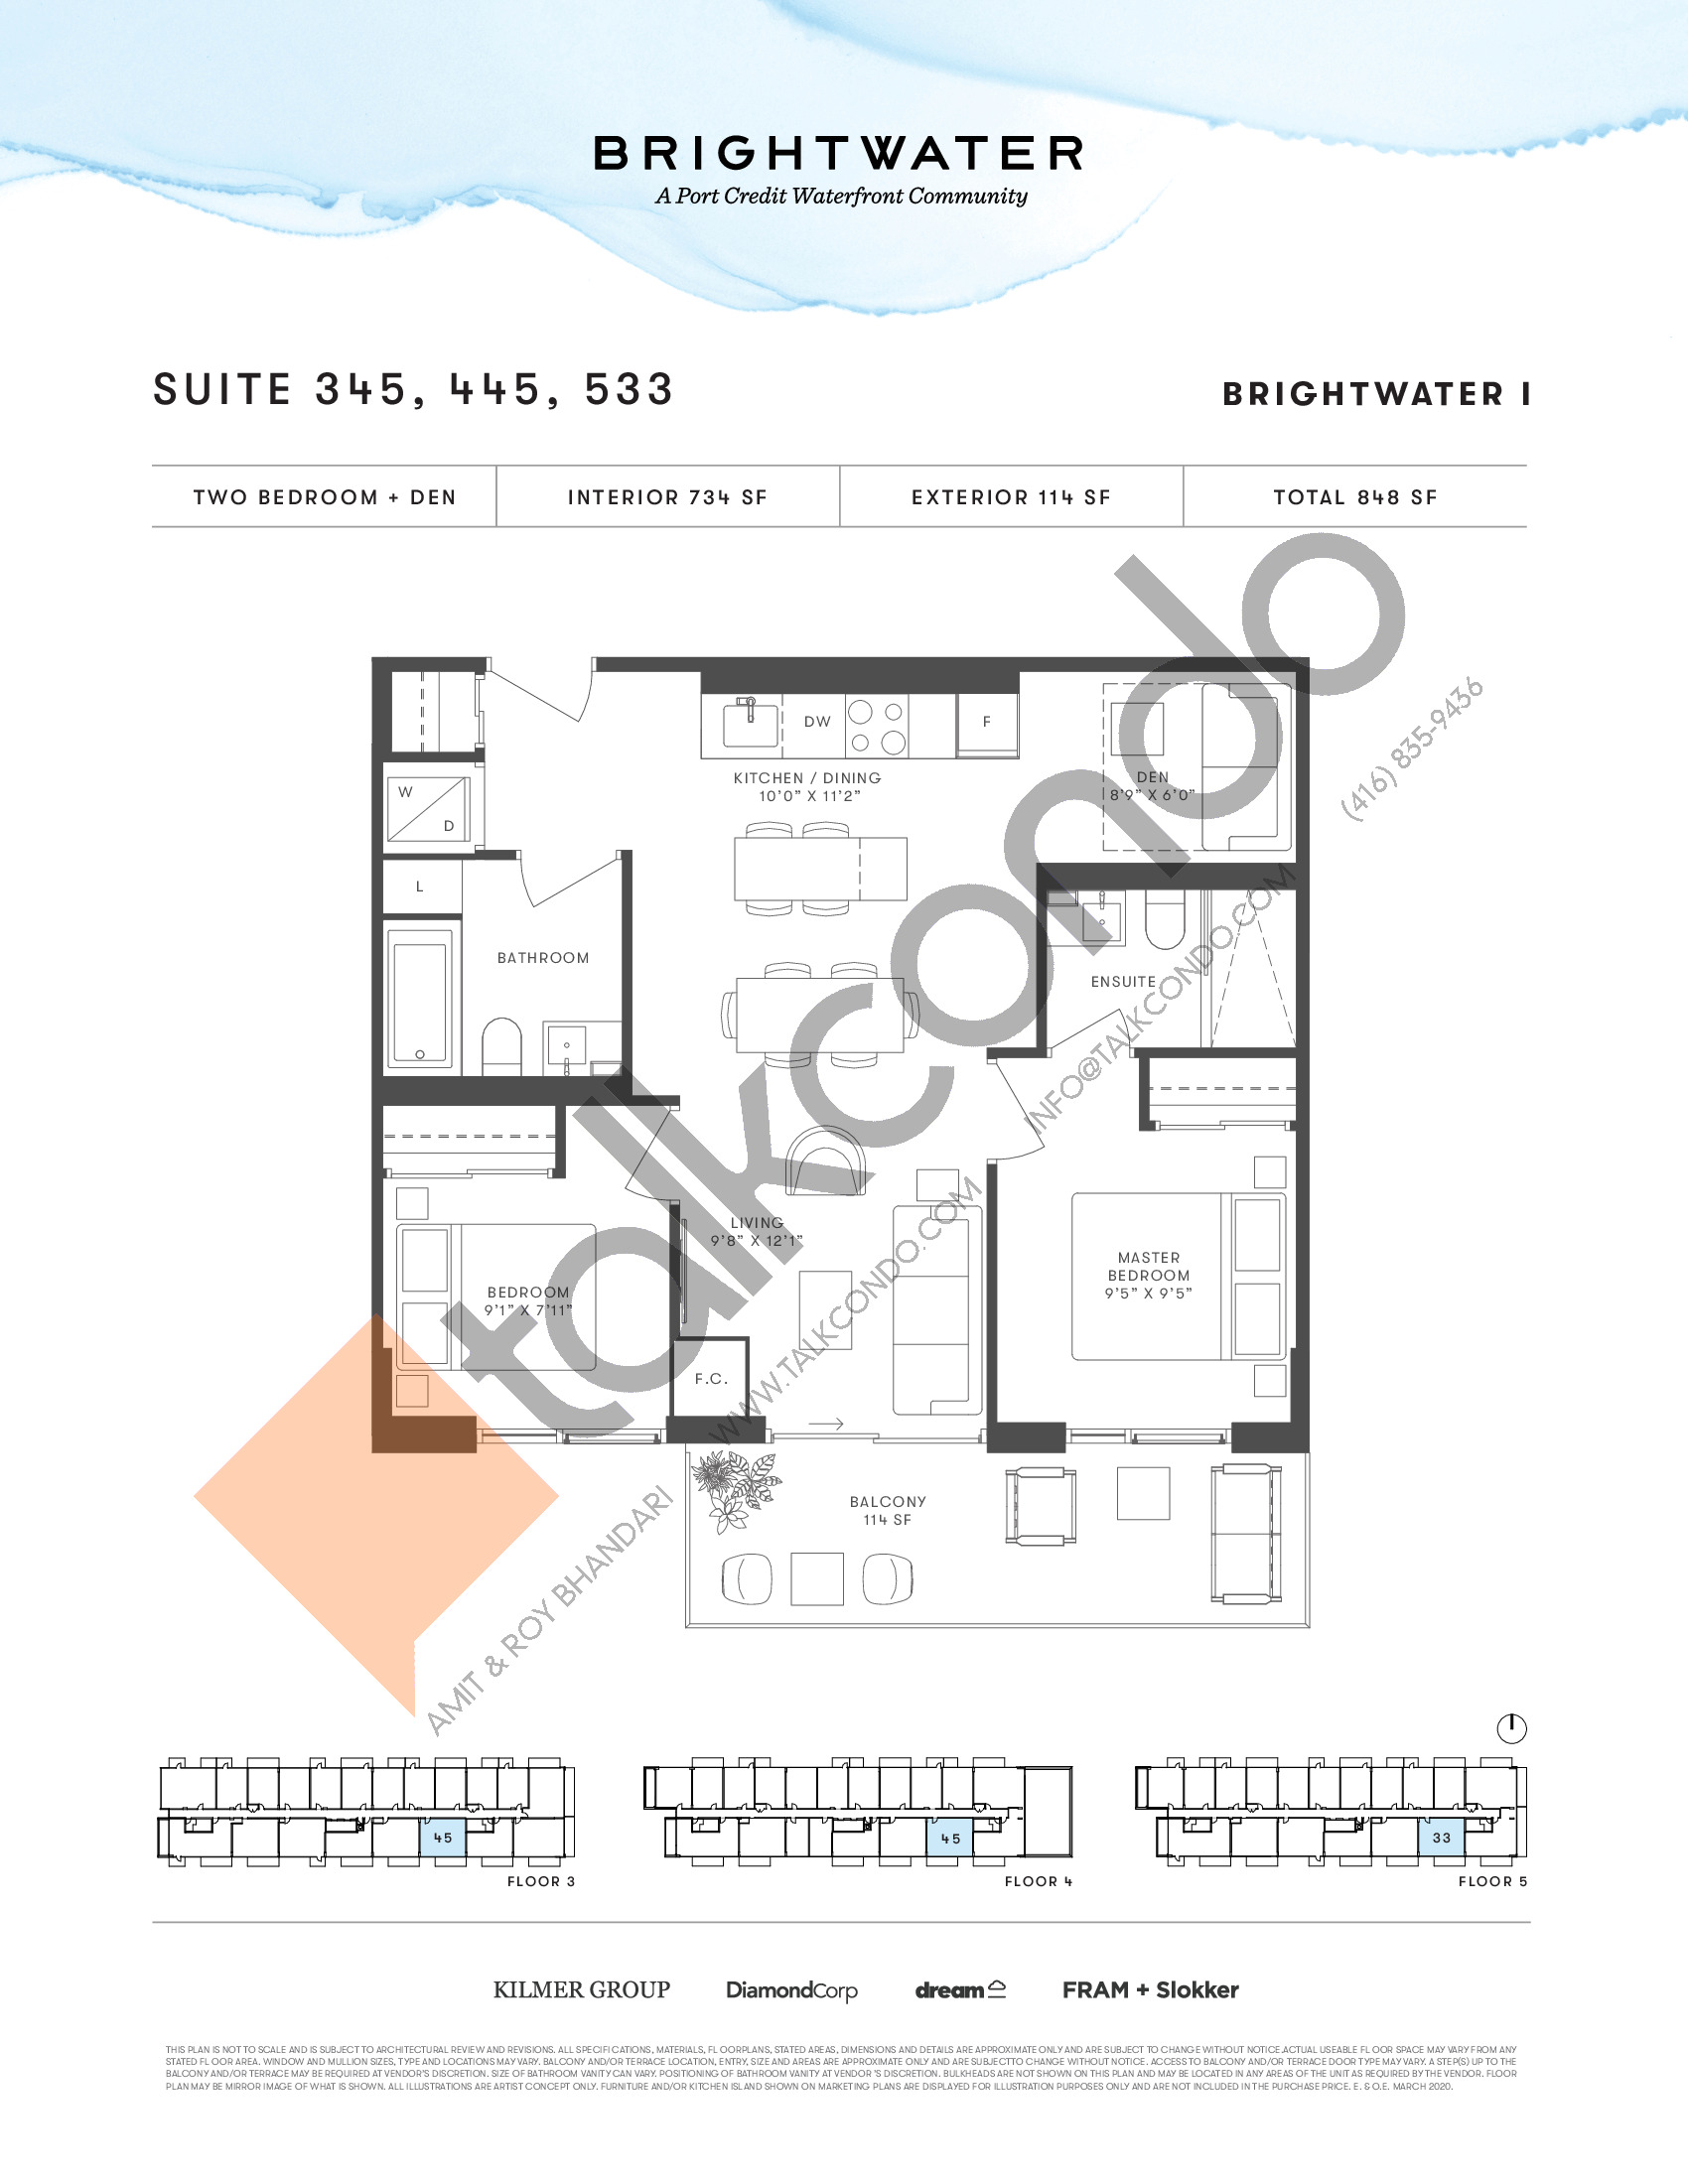 Suite 345, 445, 533 Floor Plan at Brightwater I Condos - 734 sq.ft